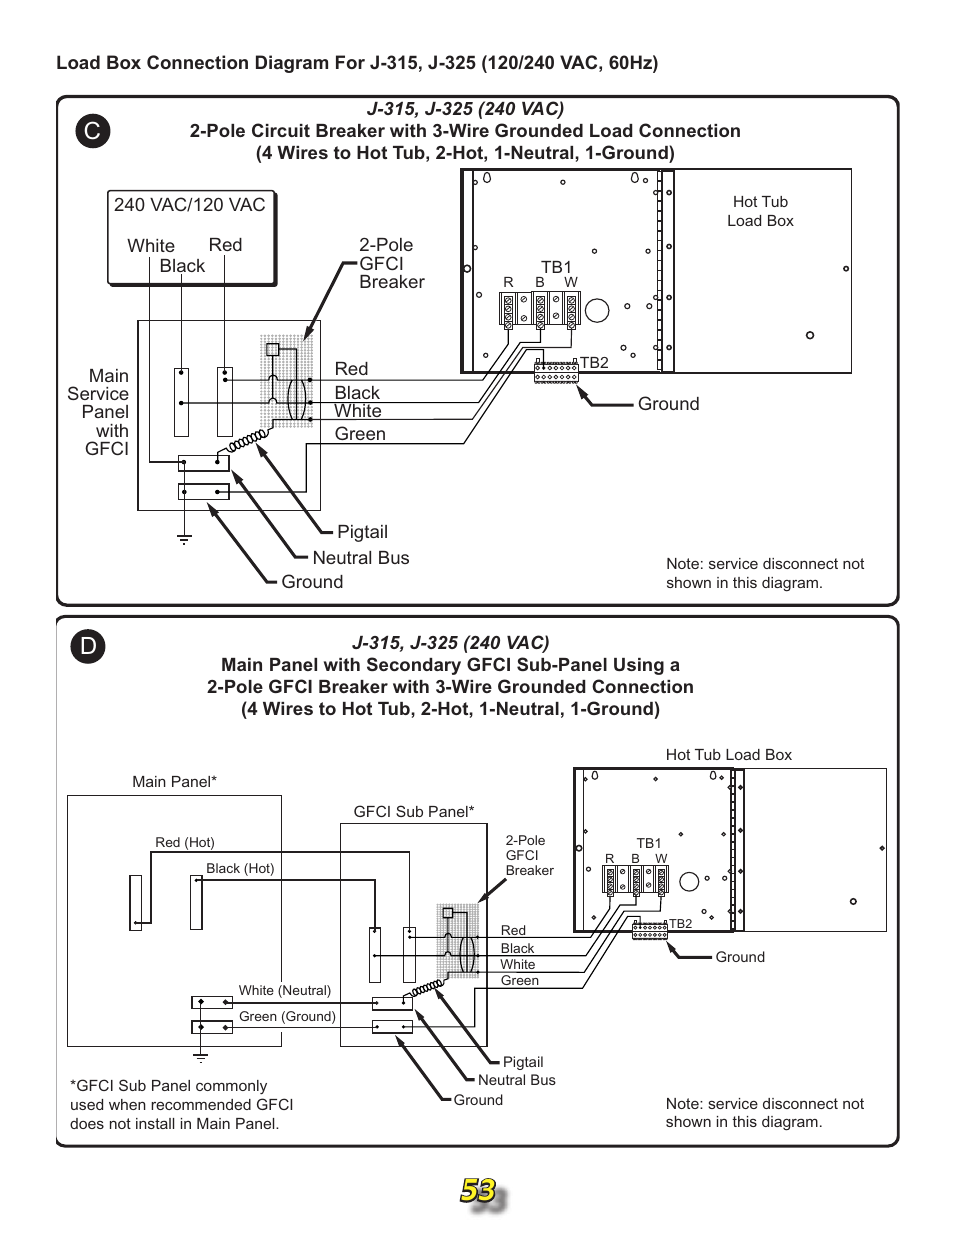 jacuzzi j315 user manual page 53 62 original mode also for rh manualsdir com jacuzzi operating manual jacuzzi j-345 user manual